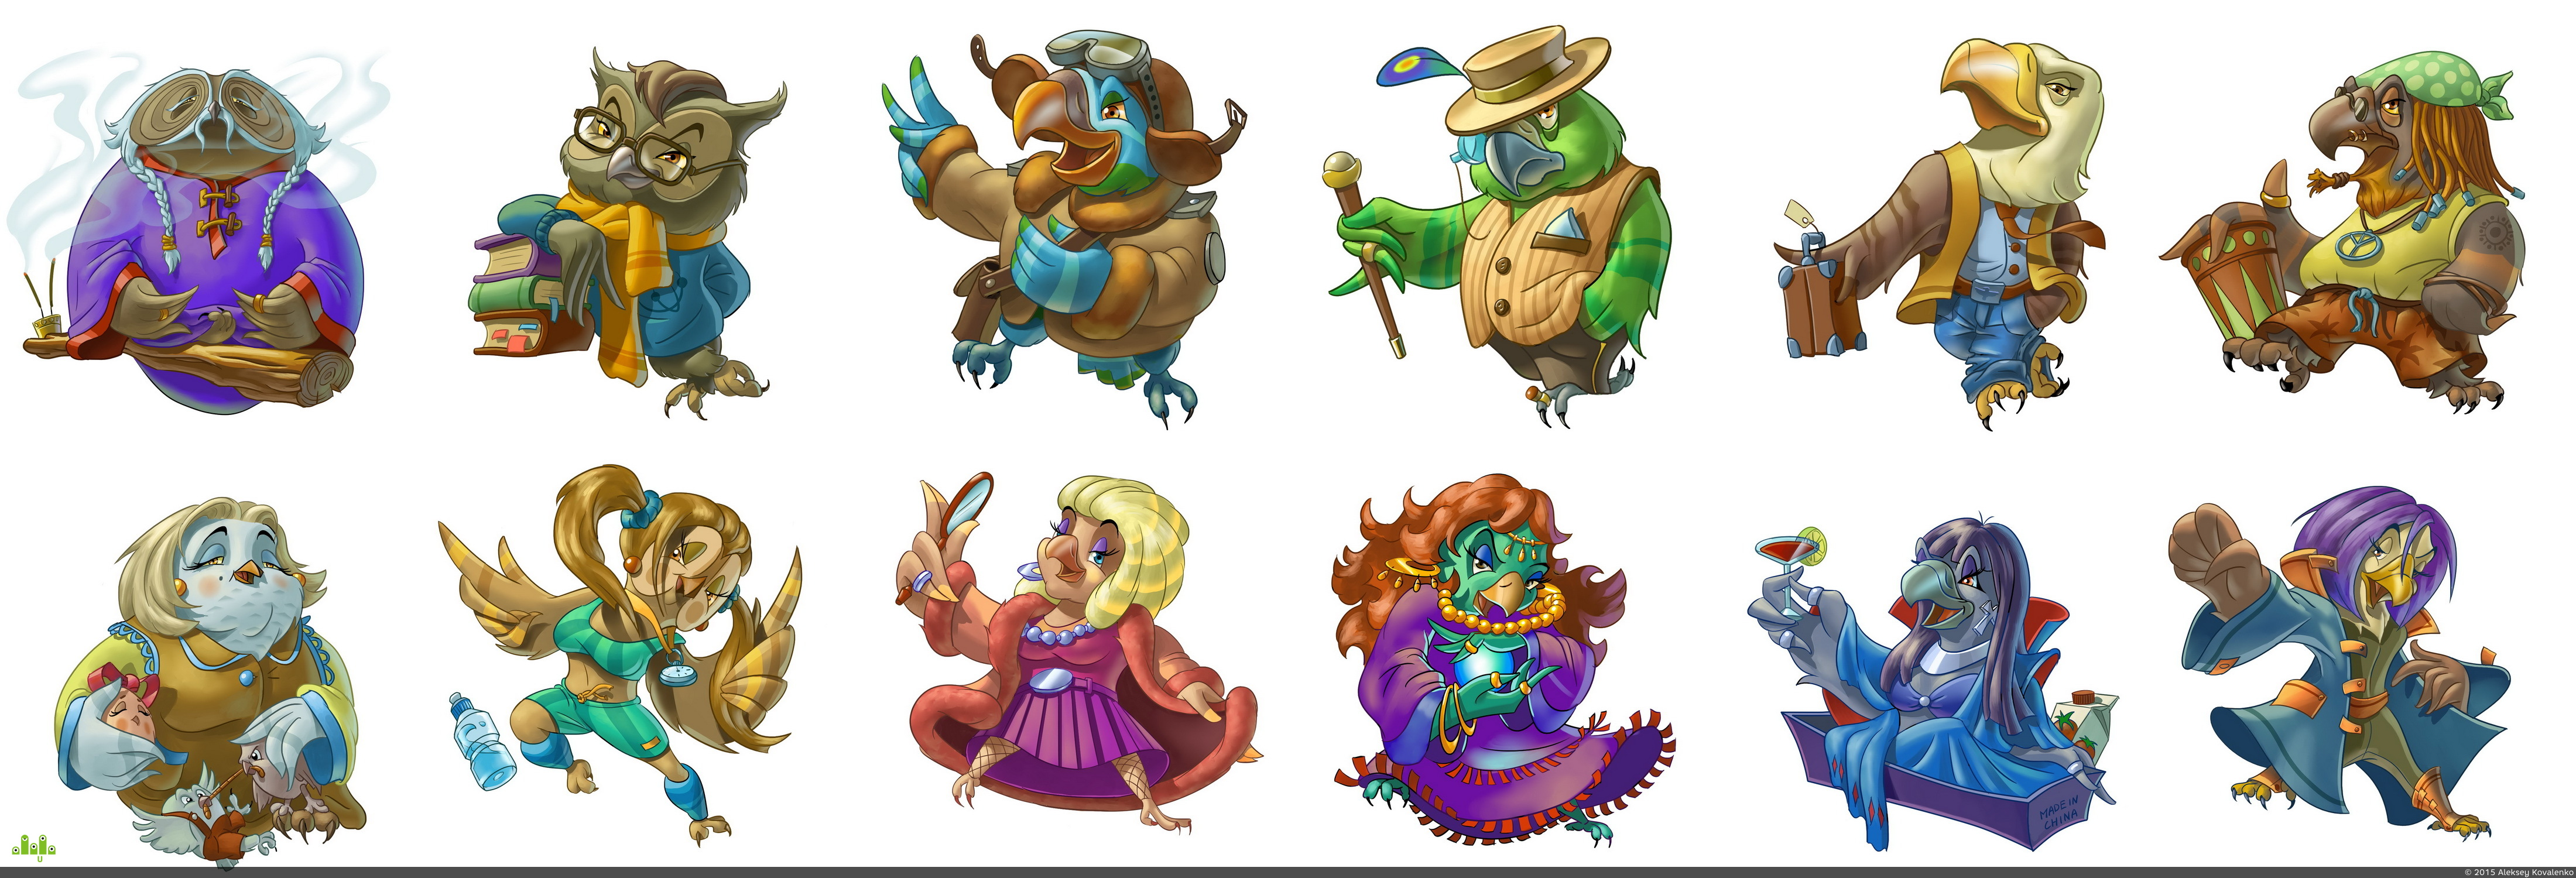 preview Пернатые персонажи для игры